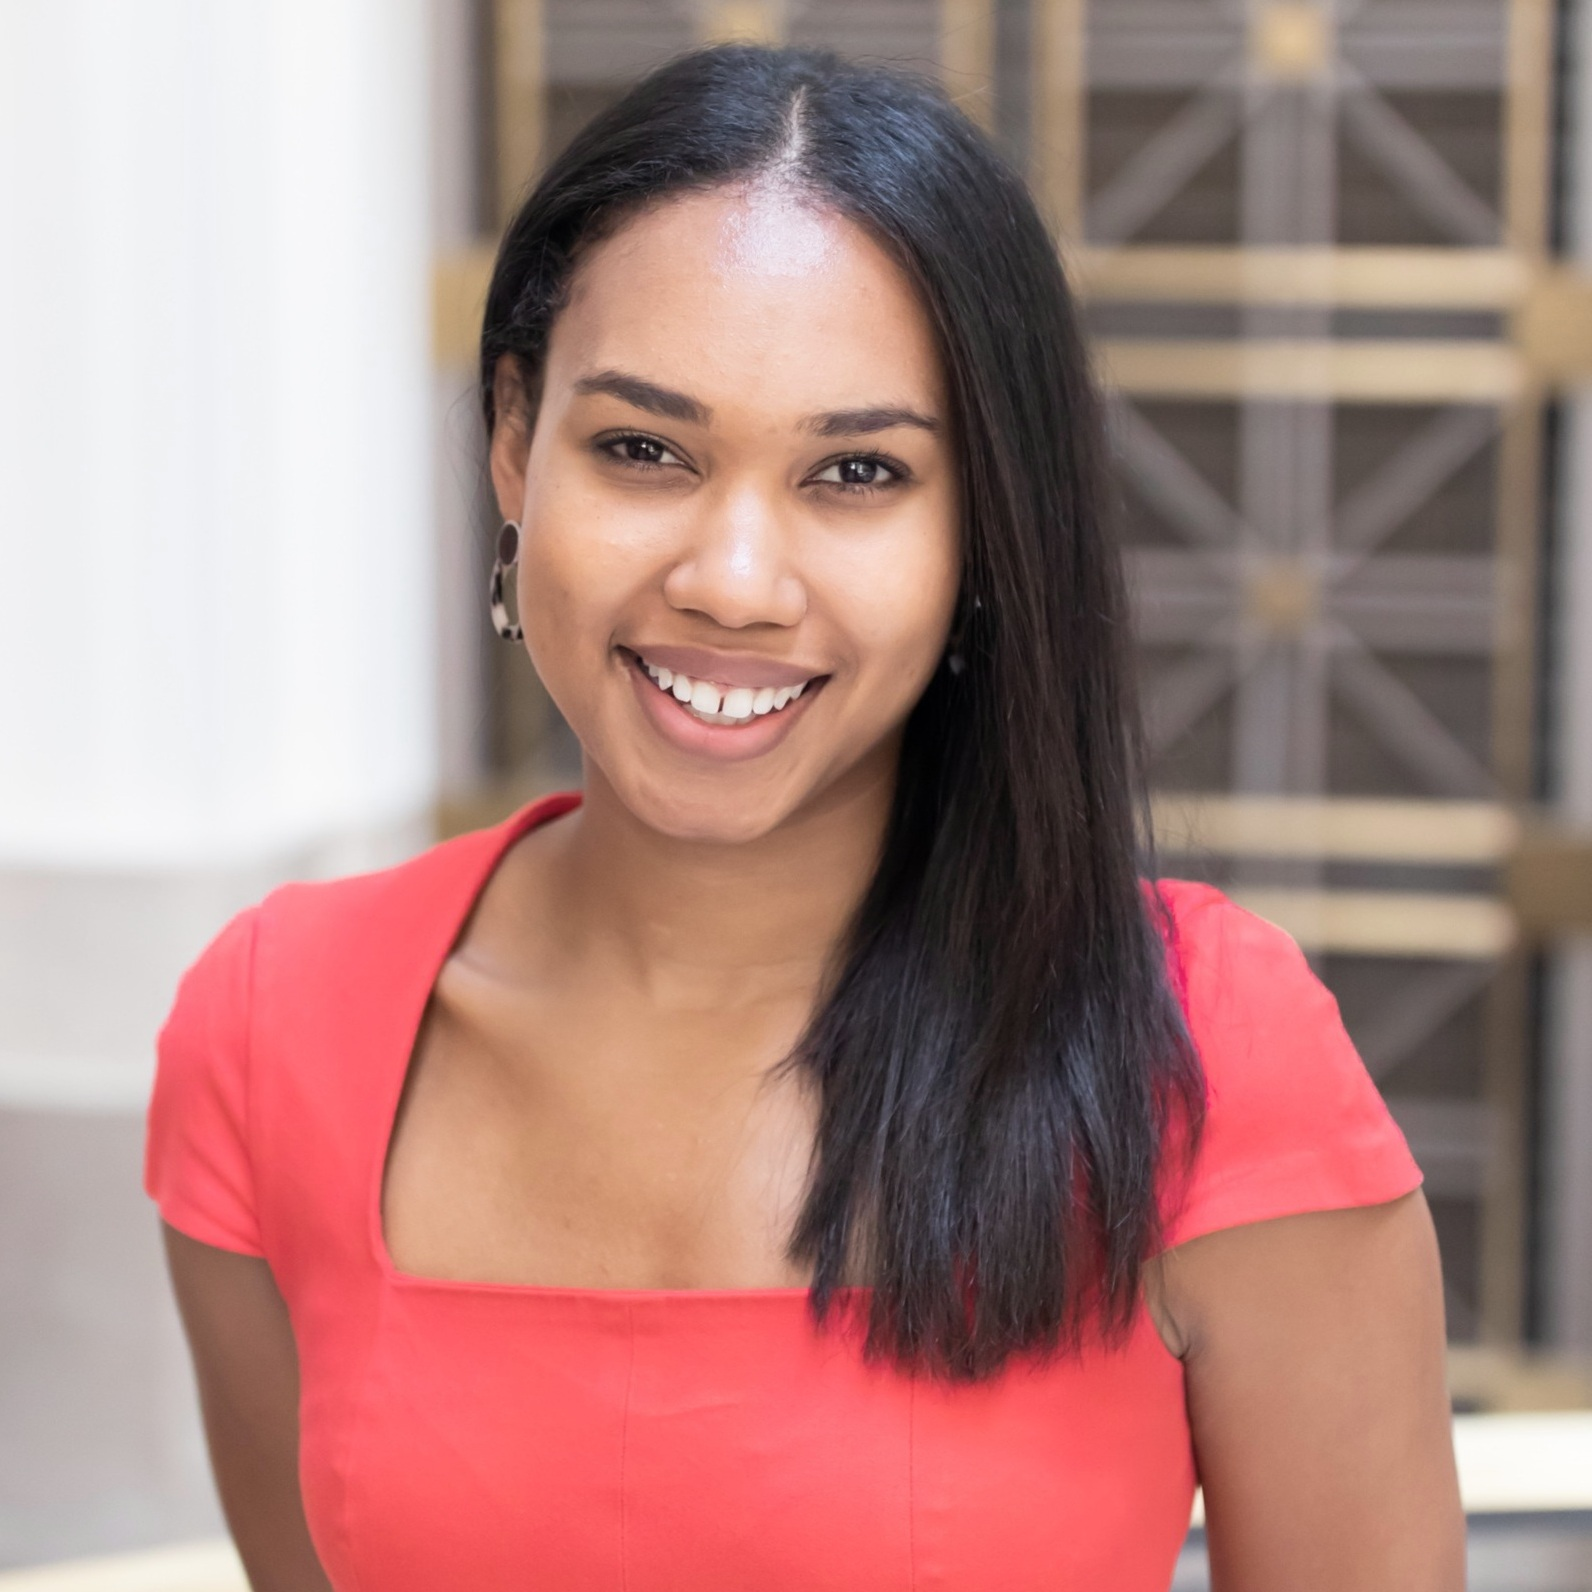 Erica Ngoenha - Director of Presidential Fellows & External Affairs, CSPC